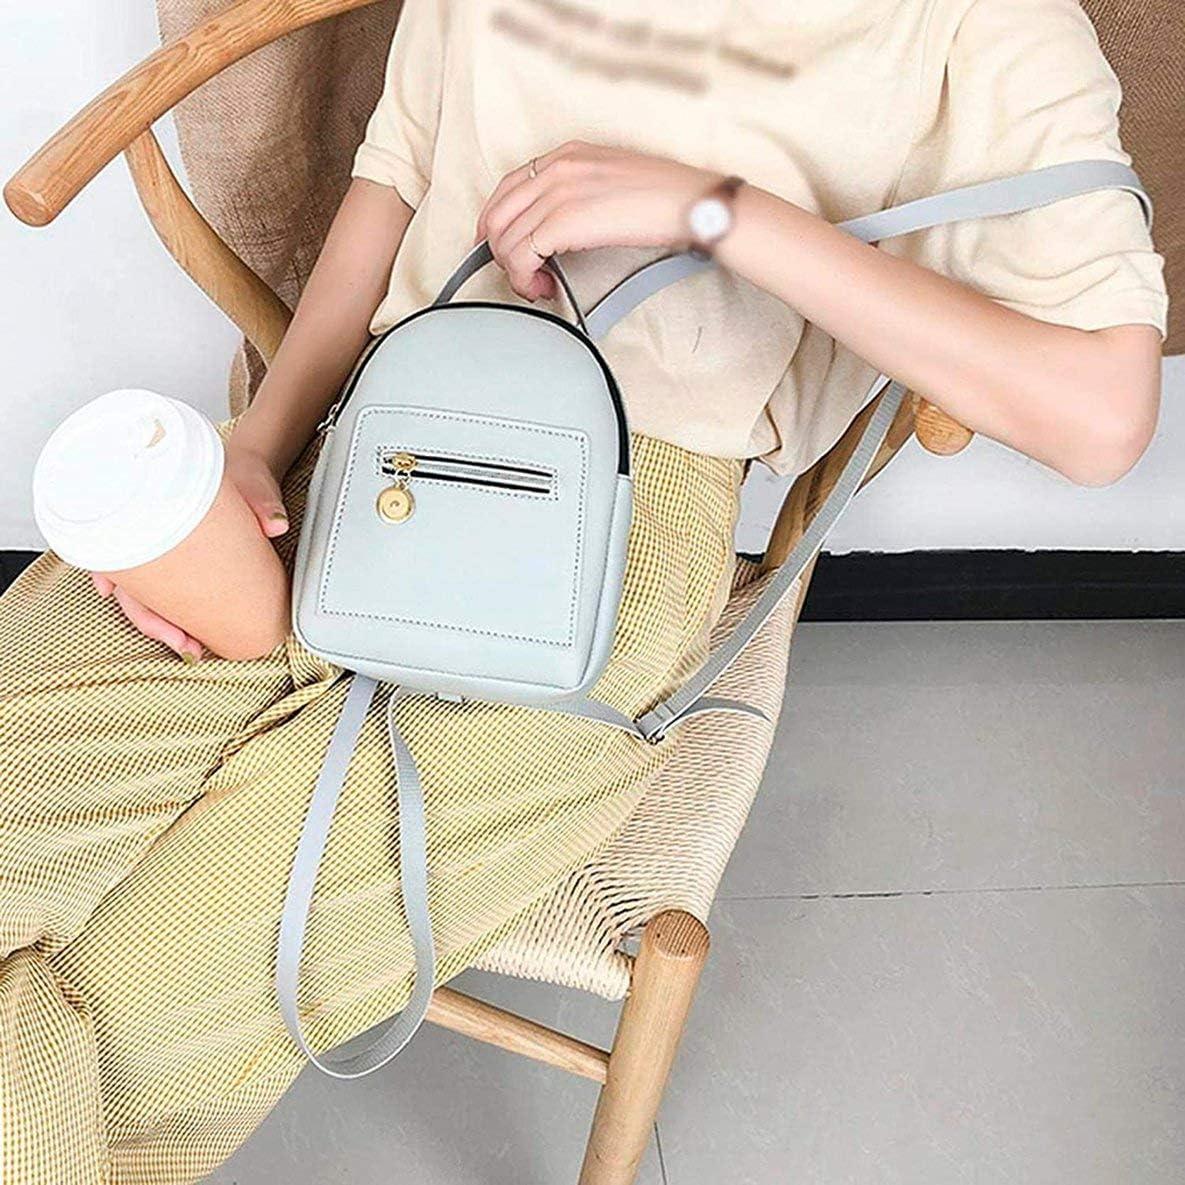 Braun nbvmngjhjlkjlUK Mini Damen Rucksack Leder Damen Taschen Kleiner Rucksack Mode Schultaschen M/ädchen Bagpack Netter weiblicher Rucksack